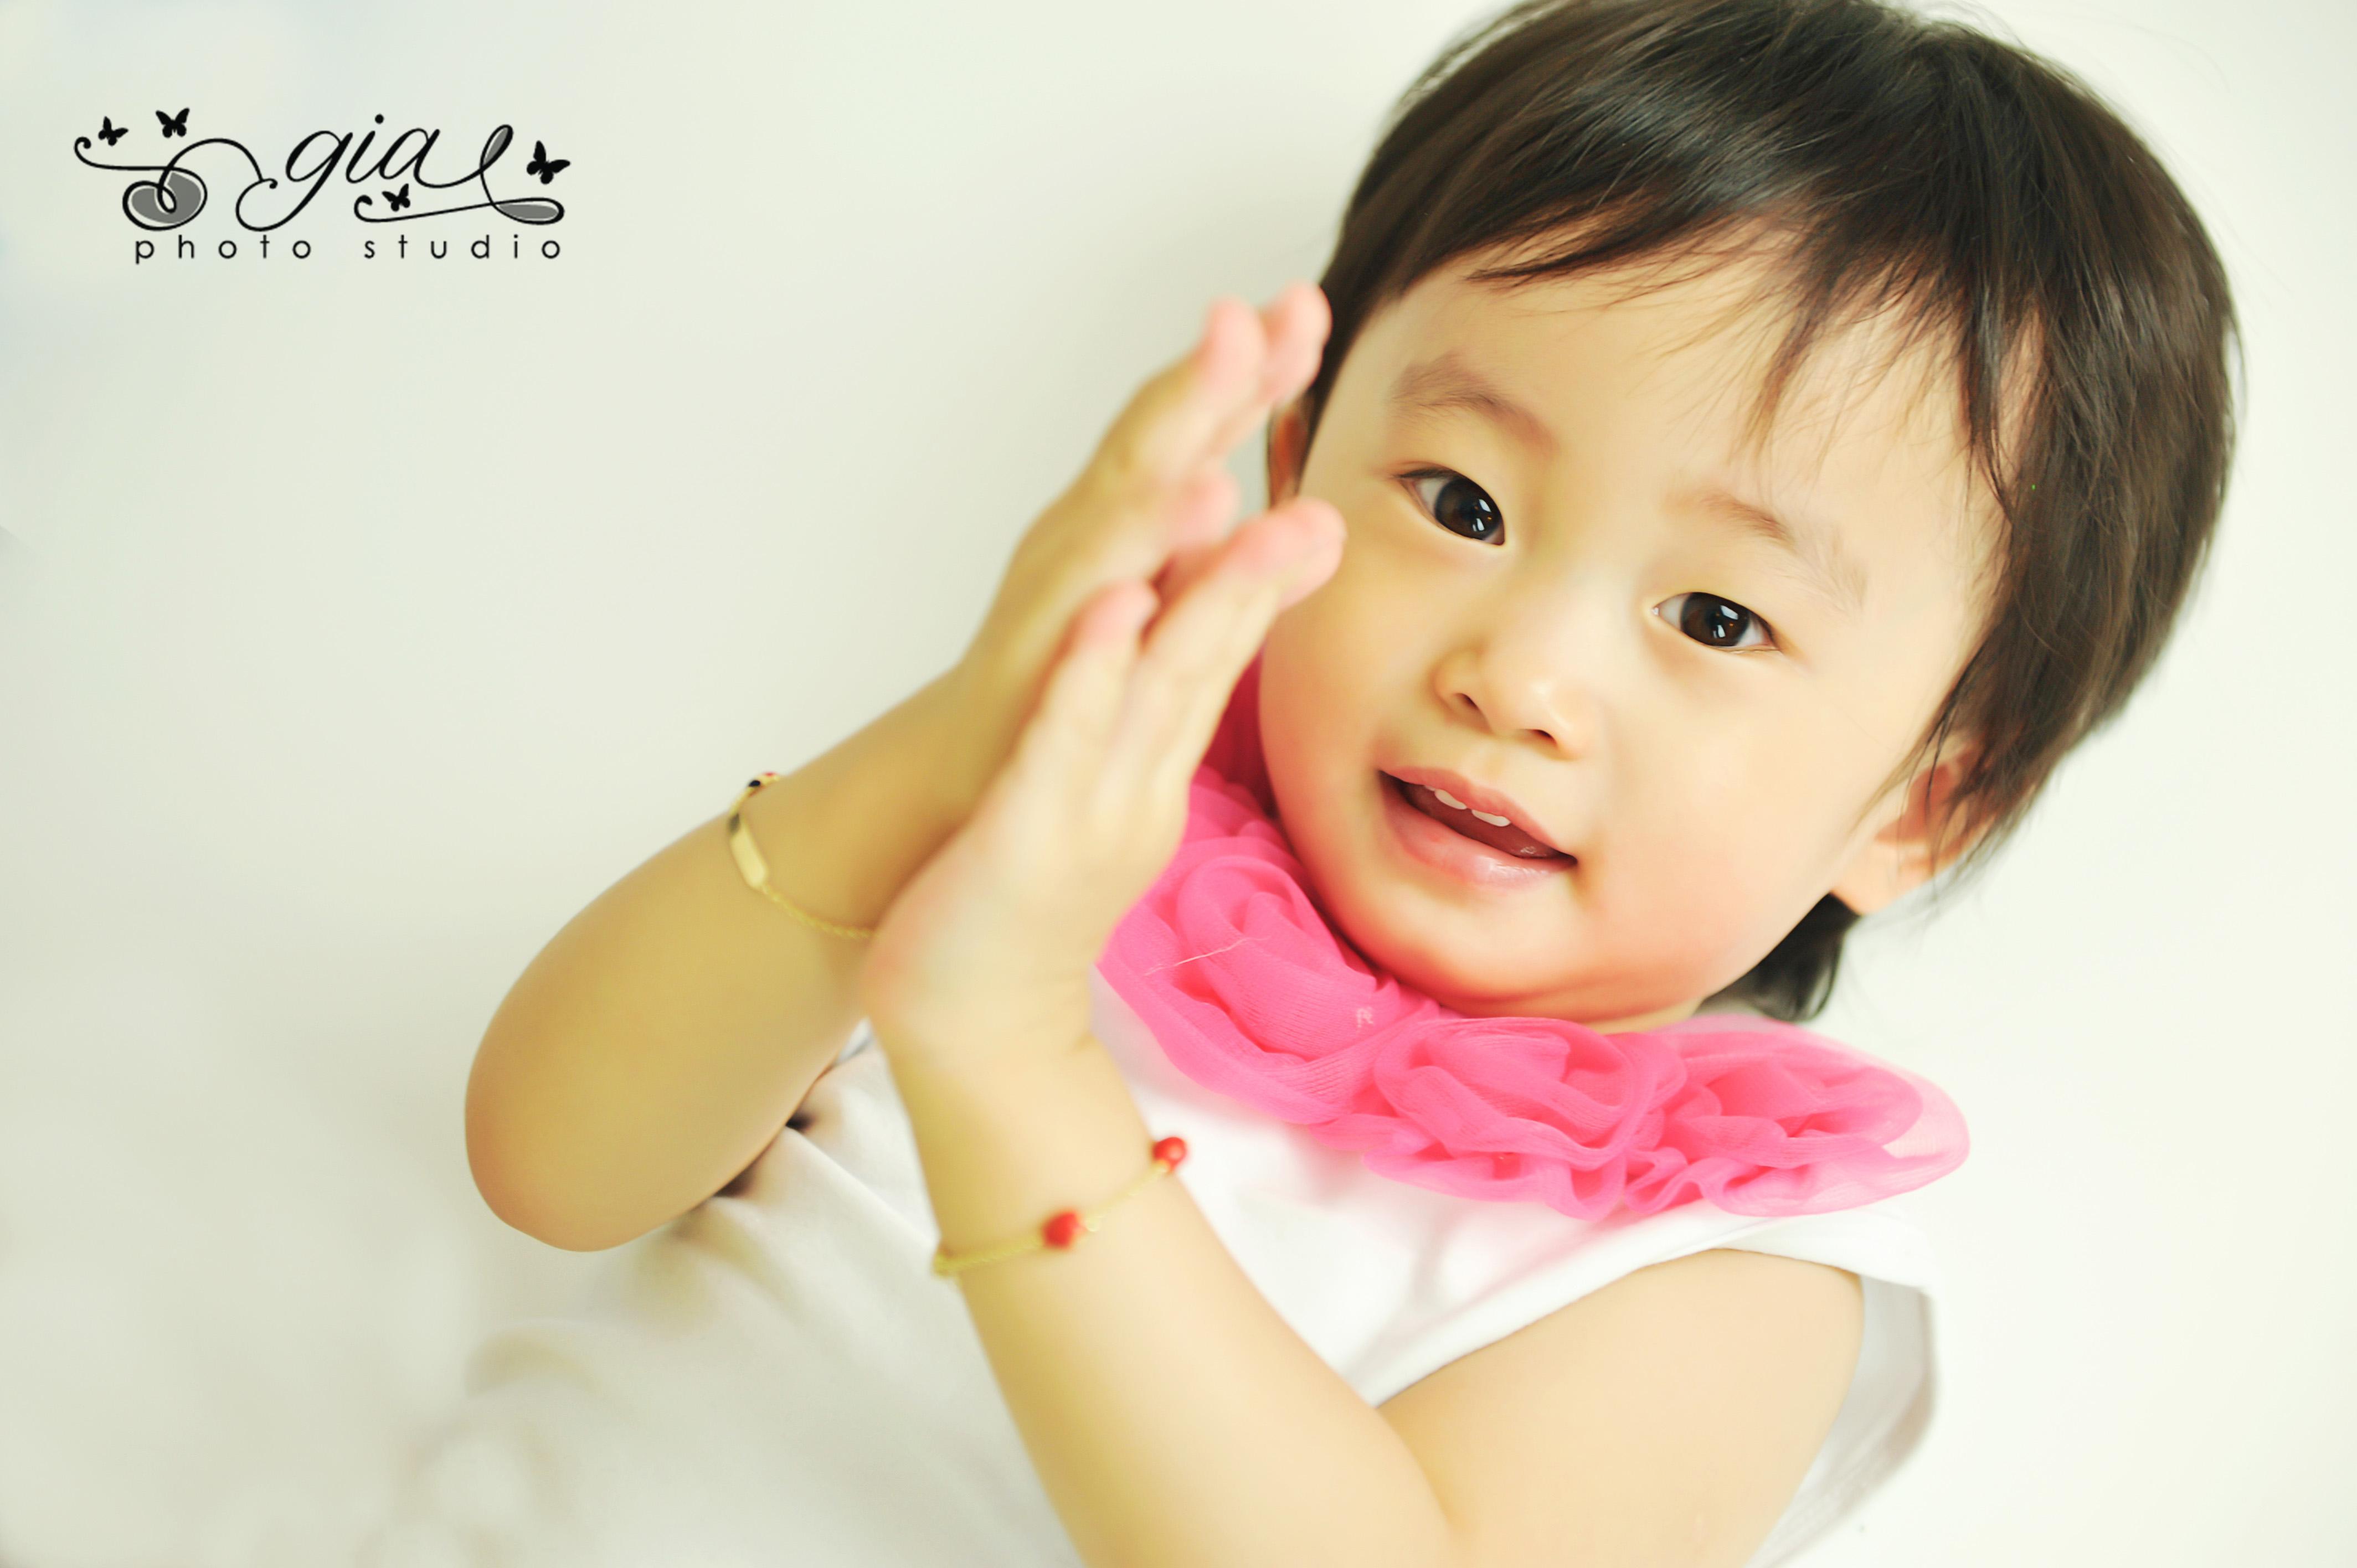 Poze copii frumosi 28